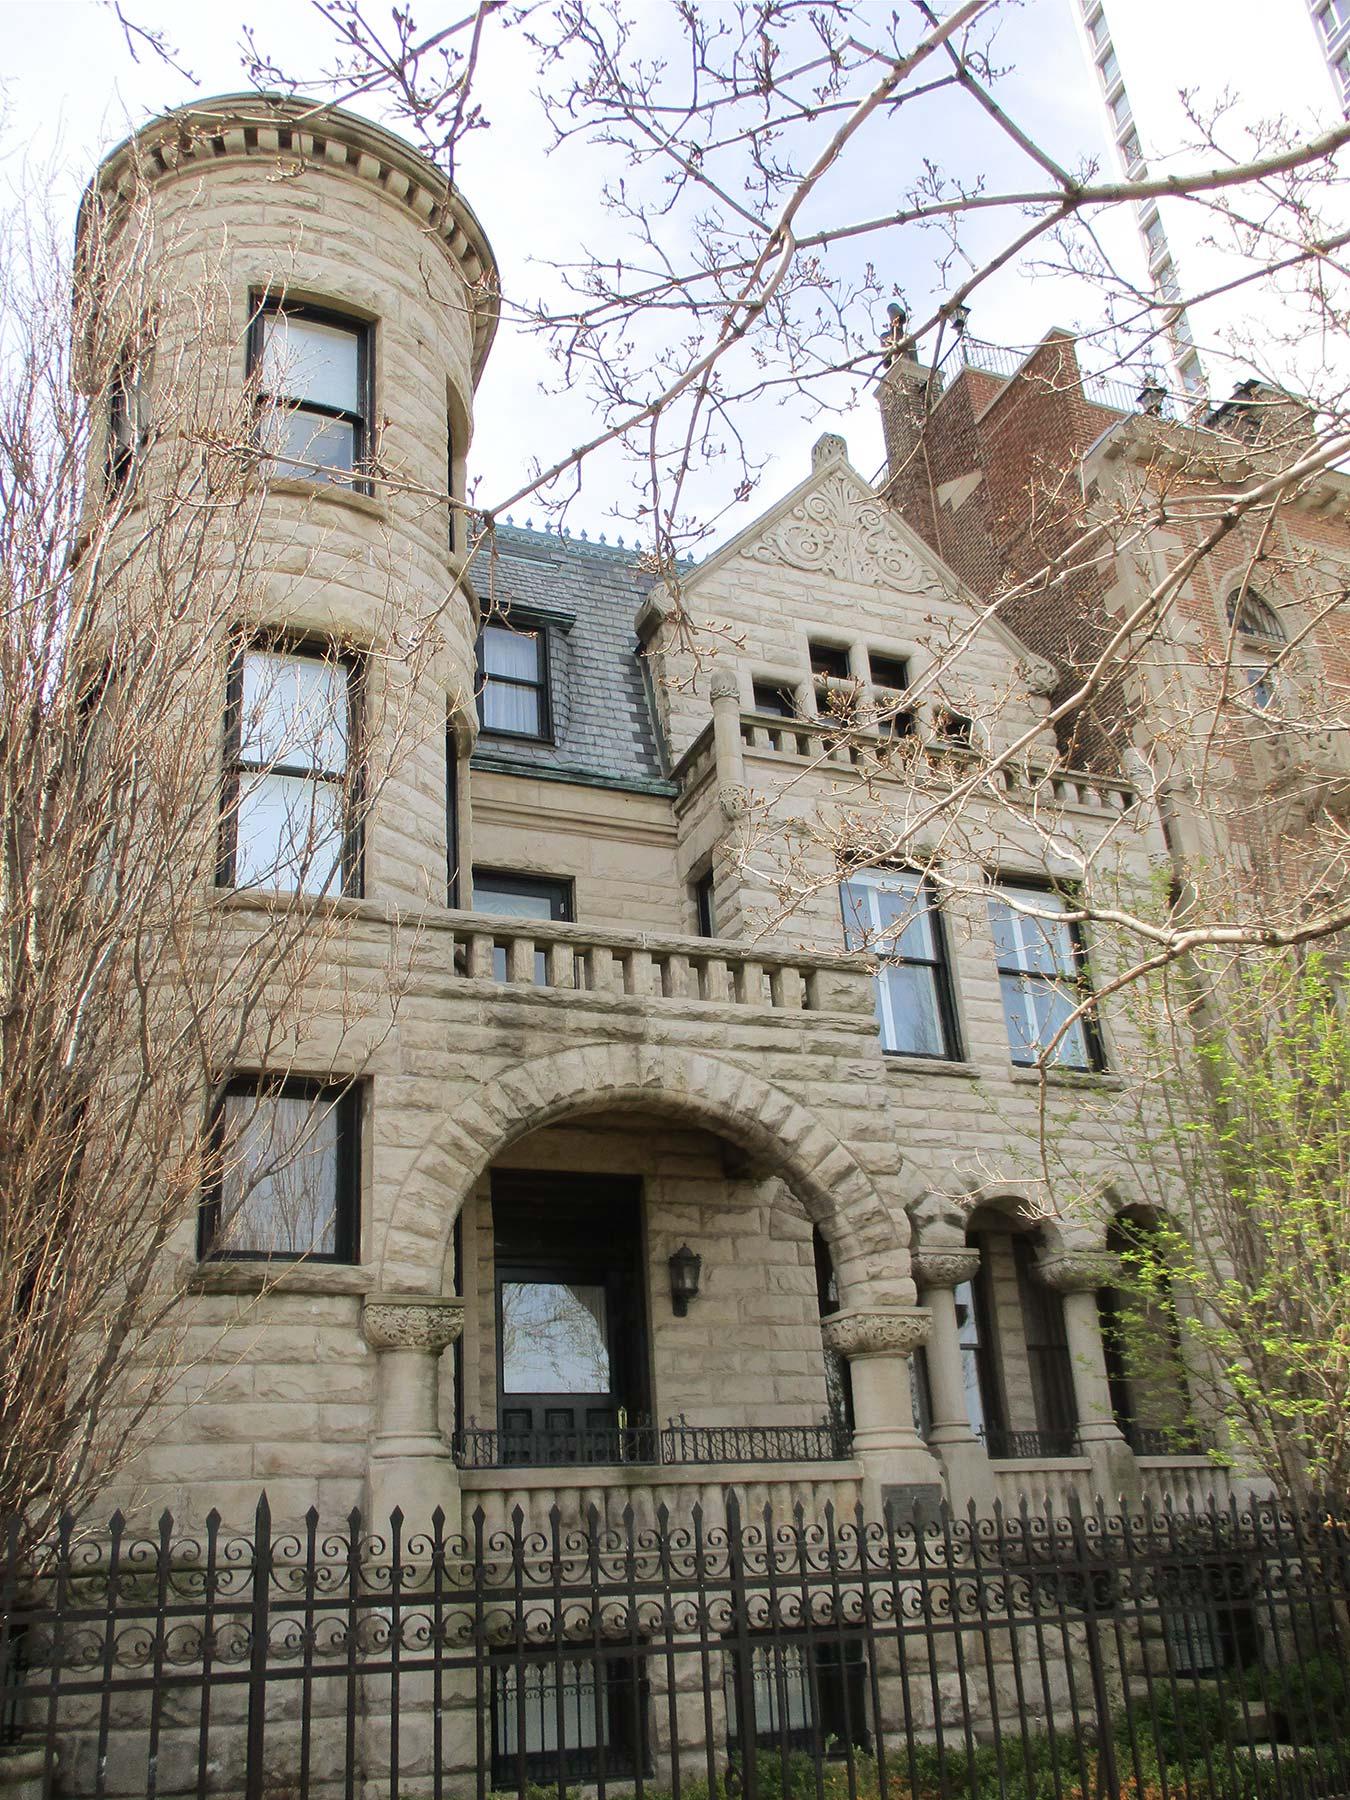 L.G. Hallberg designed the Mason Brayman Starring mansion at 1254 N. Lake Shore Drive. Photo by Julia Bachrach.